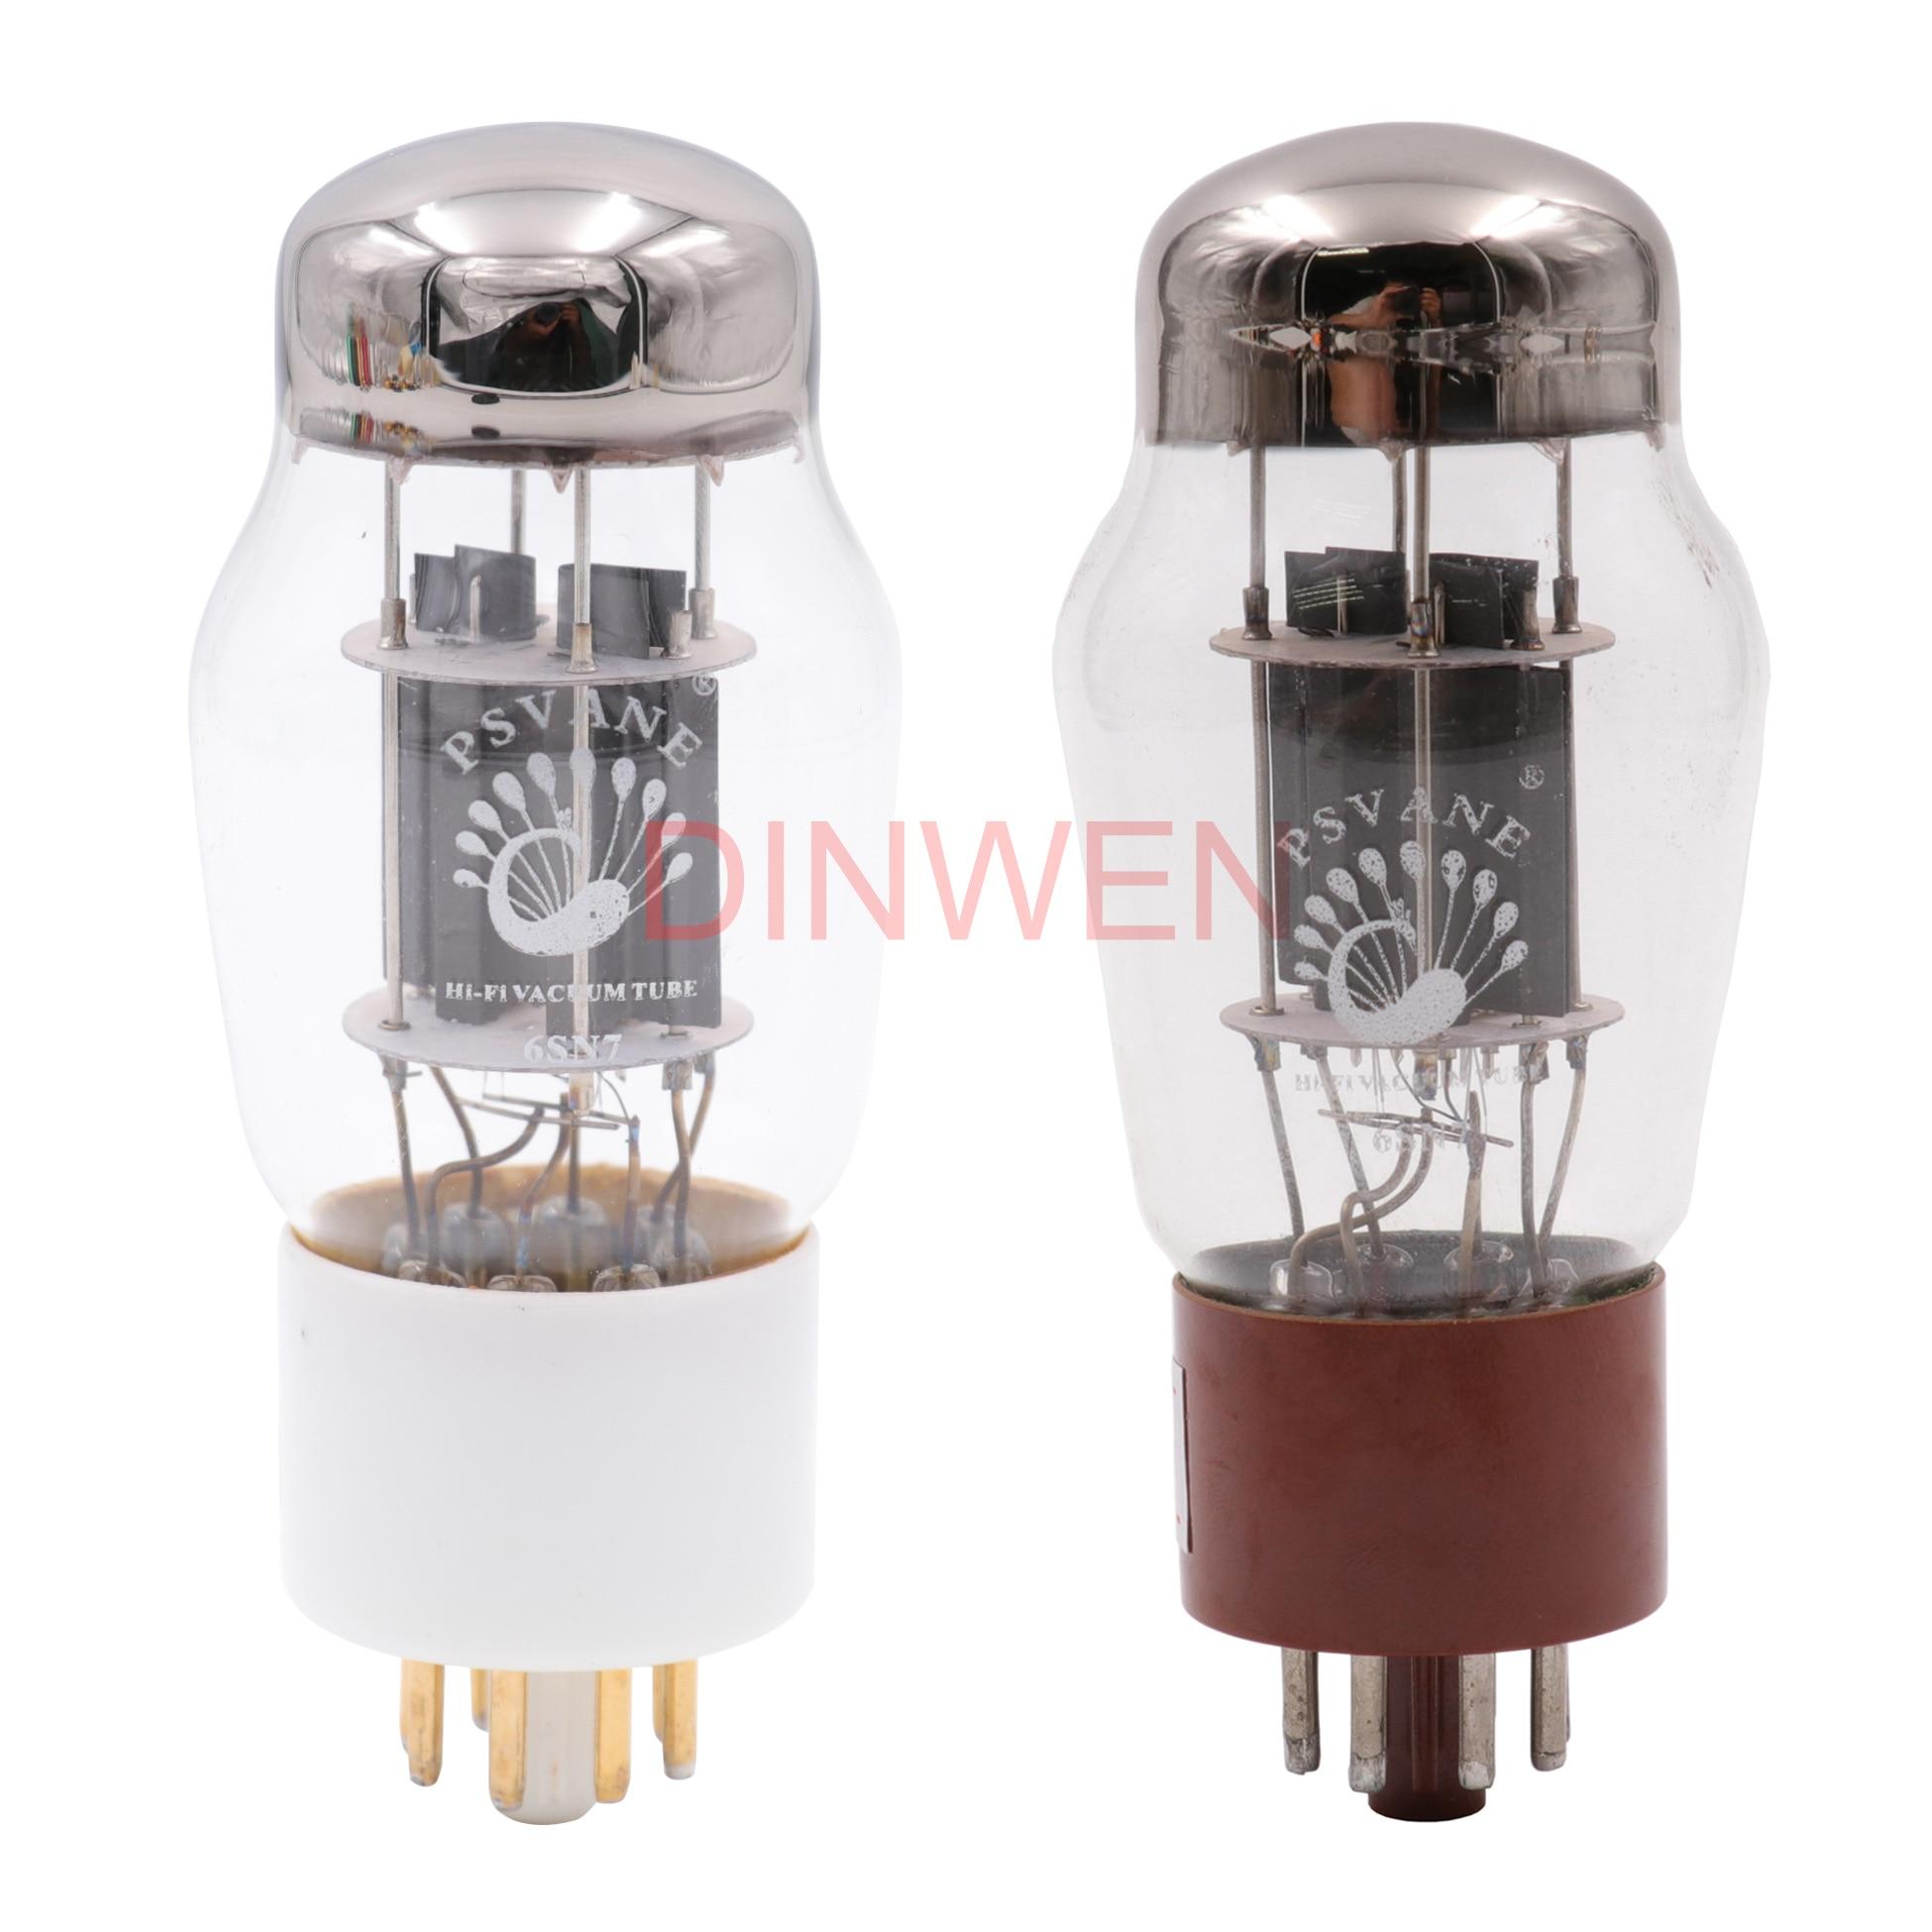 PSVANE Hifi 6SN7 Vacuum Tube Replace CV181 6N8P 6H8C Ceramic Base Hifi Audio Vintage Tube AMP DIY Factory Matched Pair